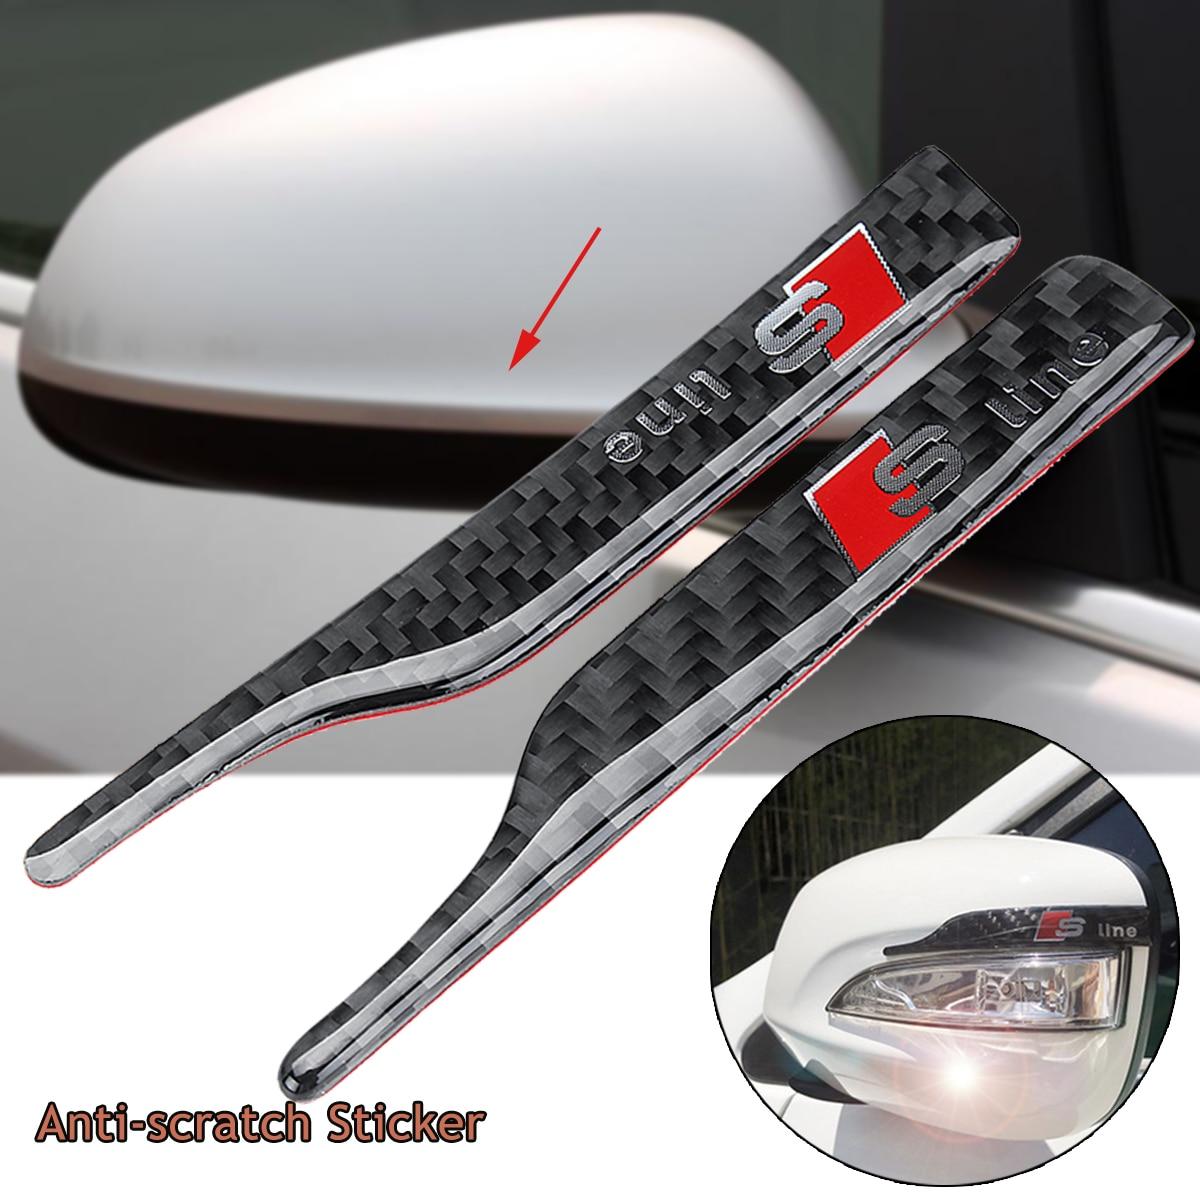 Car Rearview Mirror Carbon Fiber Anti-scratch Sticker for Audi A1 A2 A3 A4 A5 A6 A6L A7 A8 C7 Q3 Q5 Q7 RS3 RS4 SQ5 S5 RS5 RS7 S6